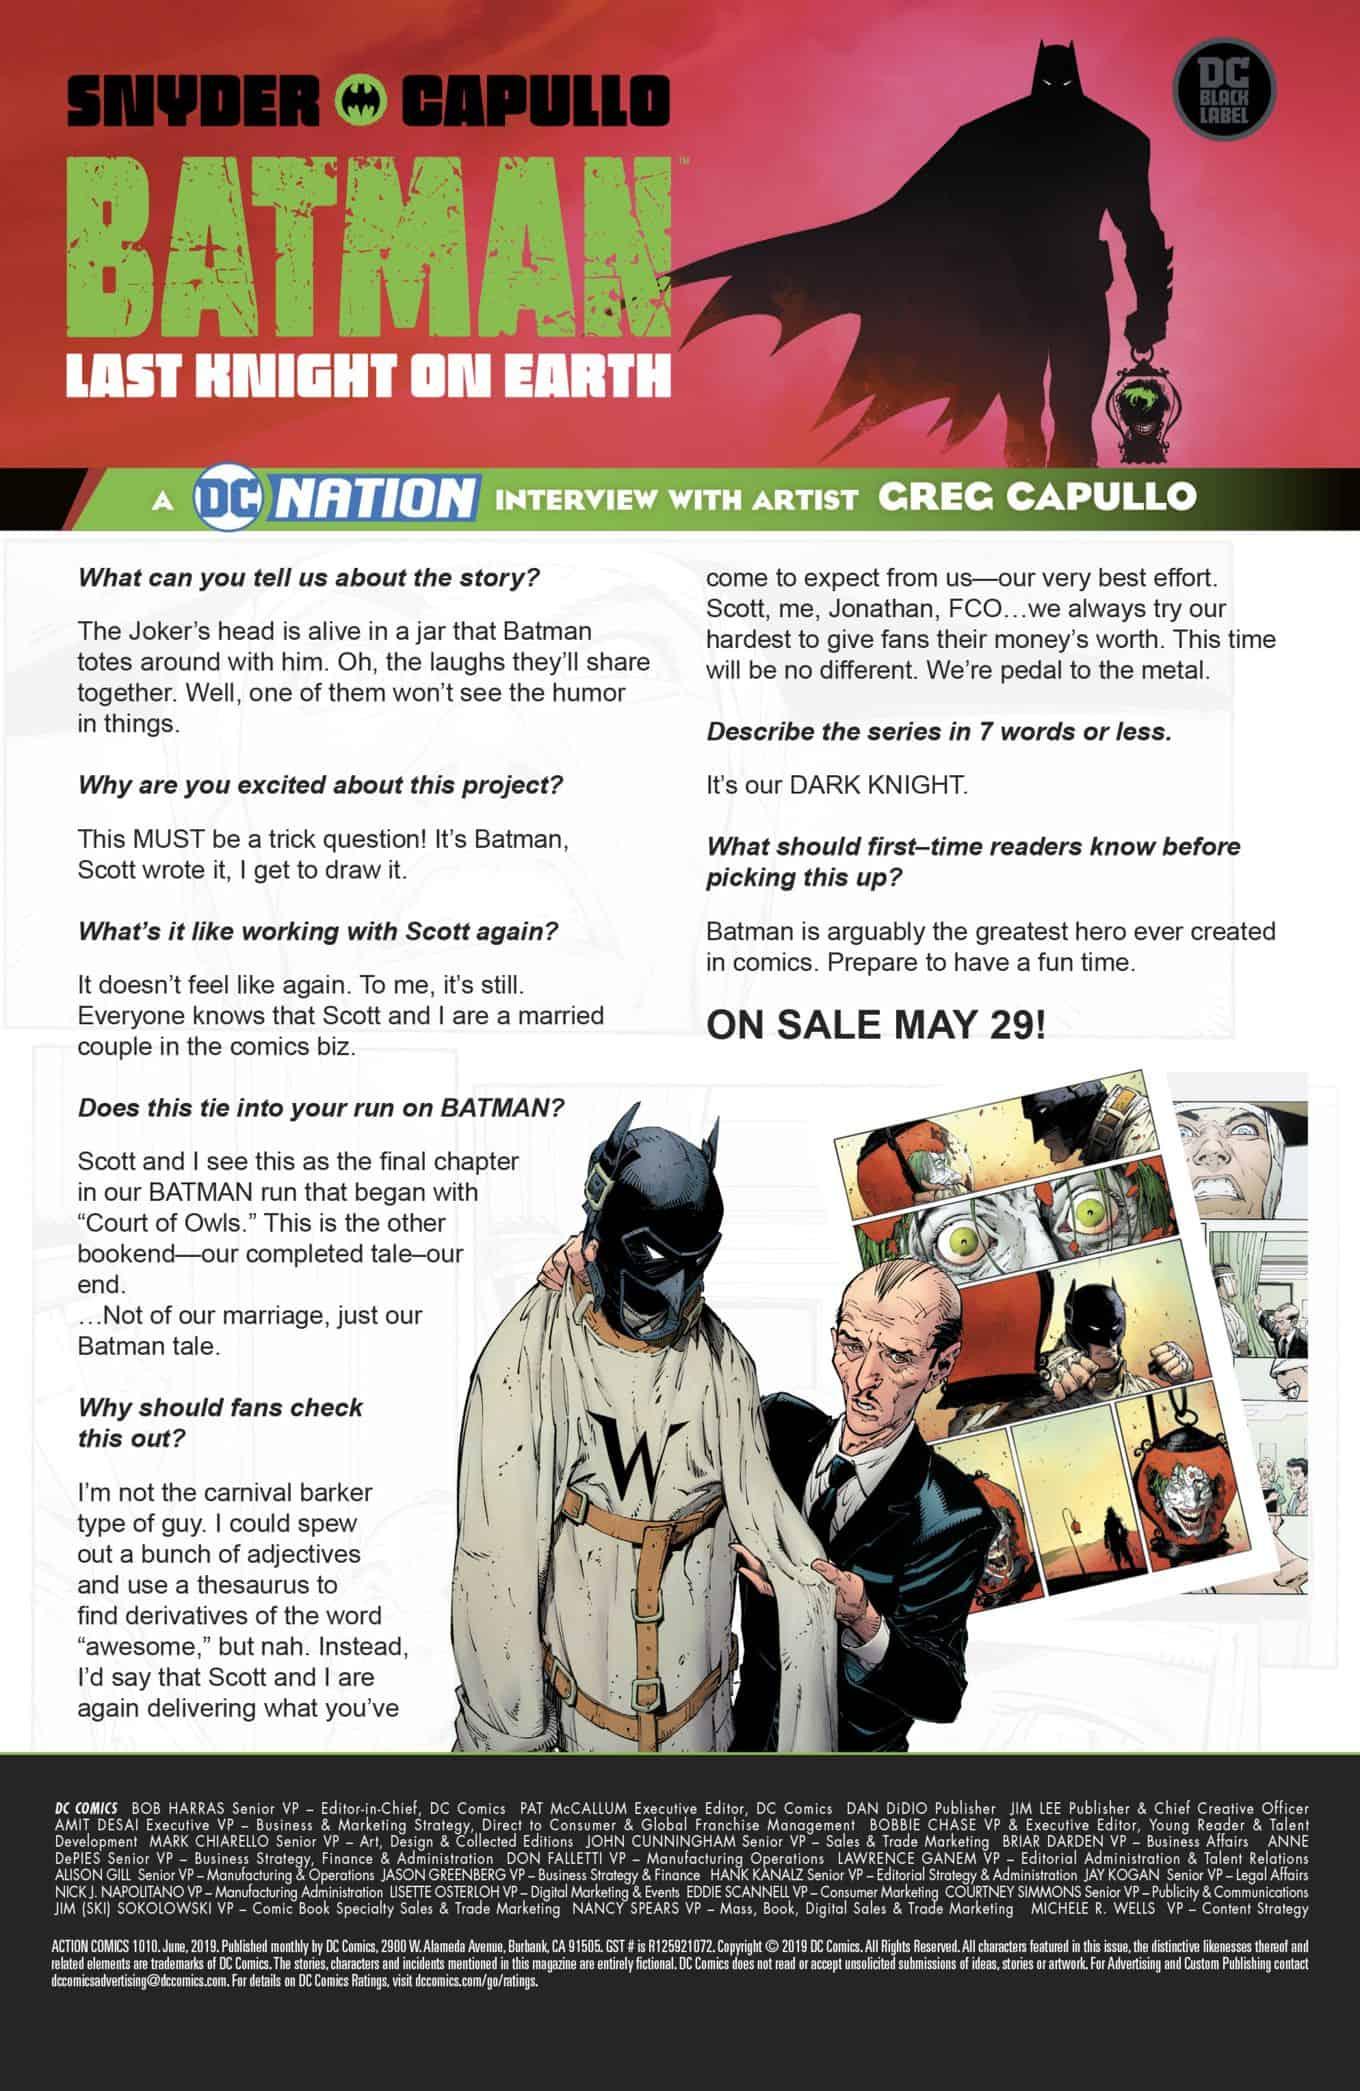 DC Comics Teases The Last Chapter Of The Batman Saga AKA The Final